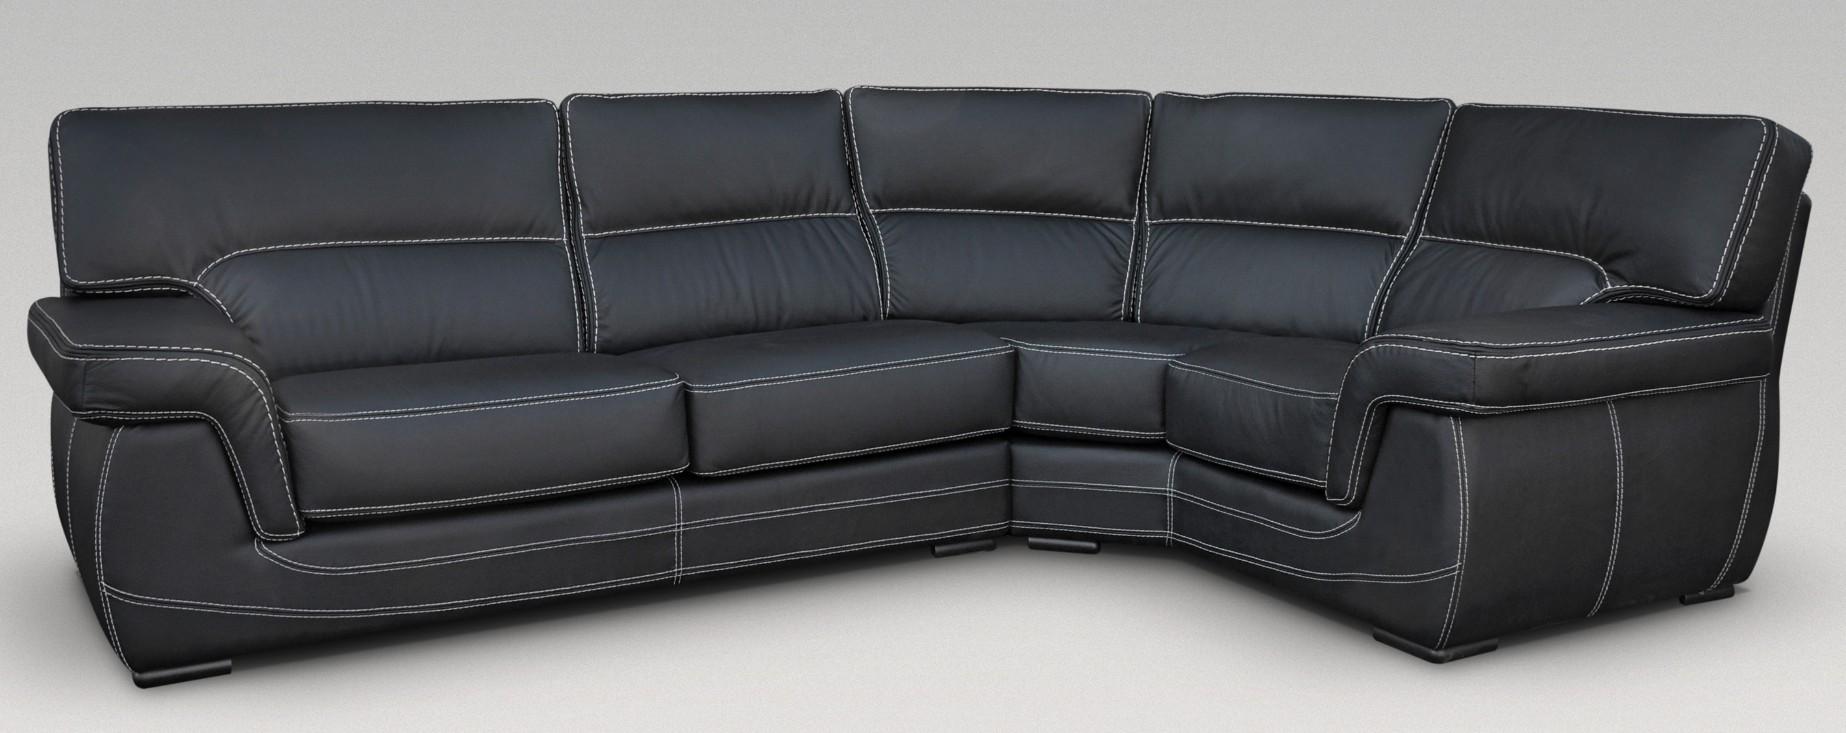 Babylon Corner Group Italian Leather Sofa Blackjpg